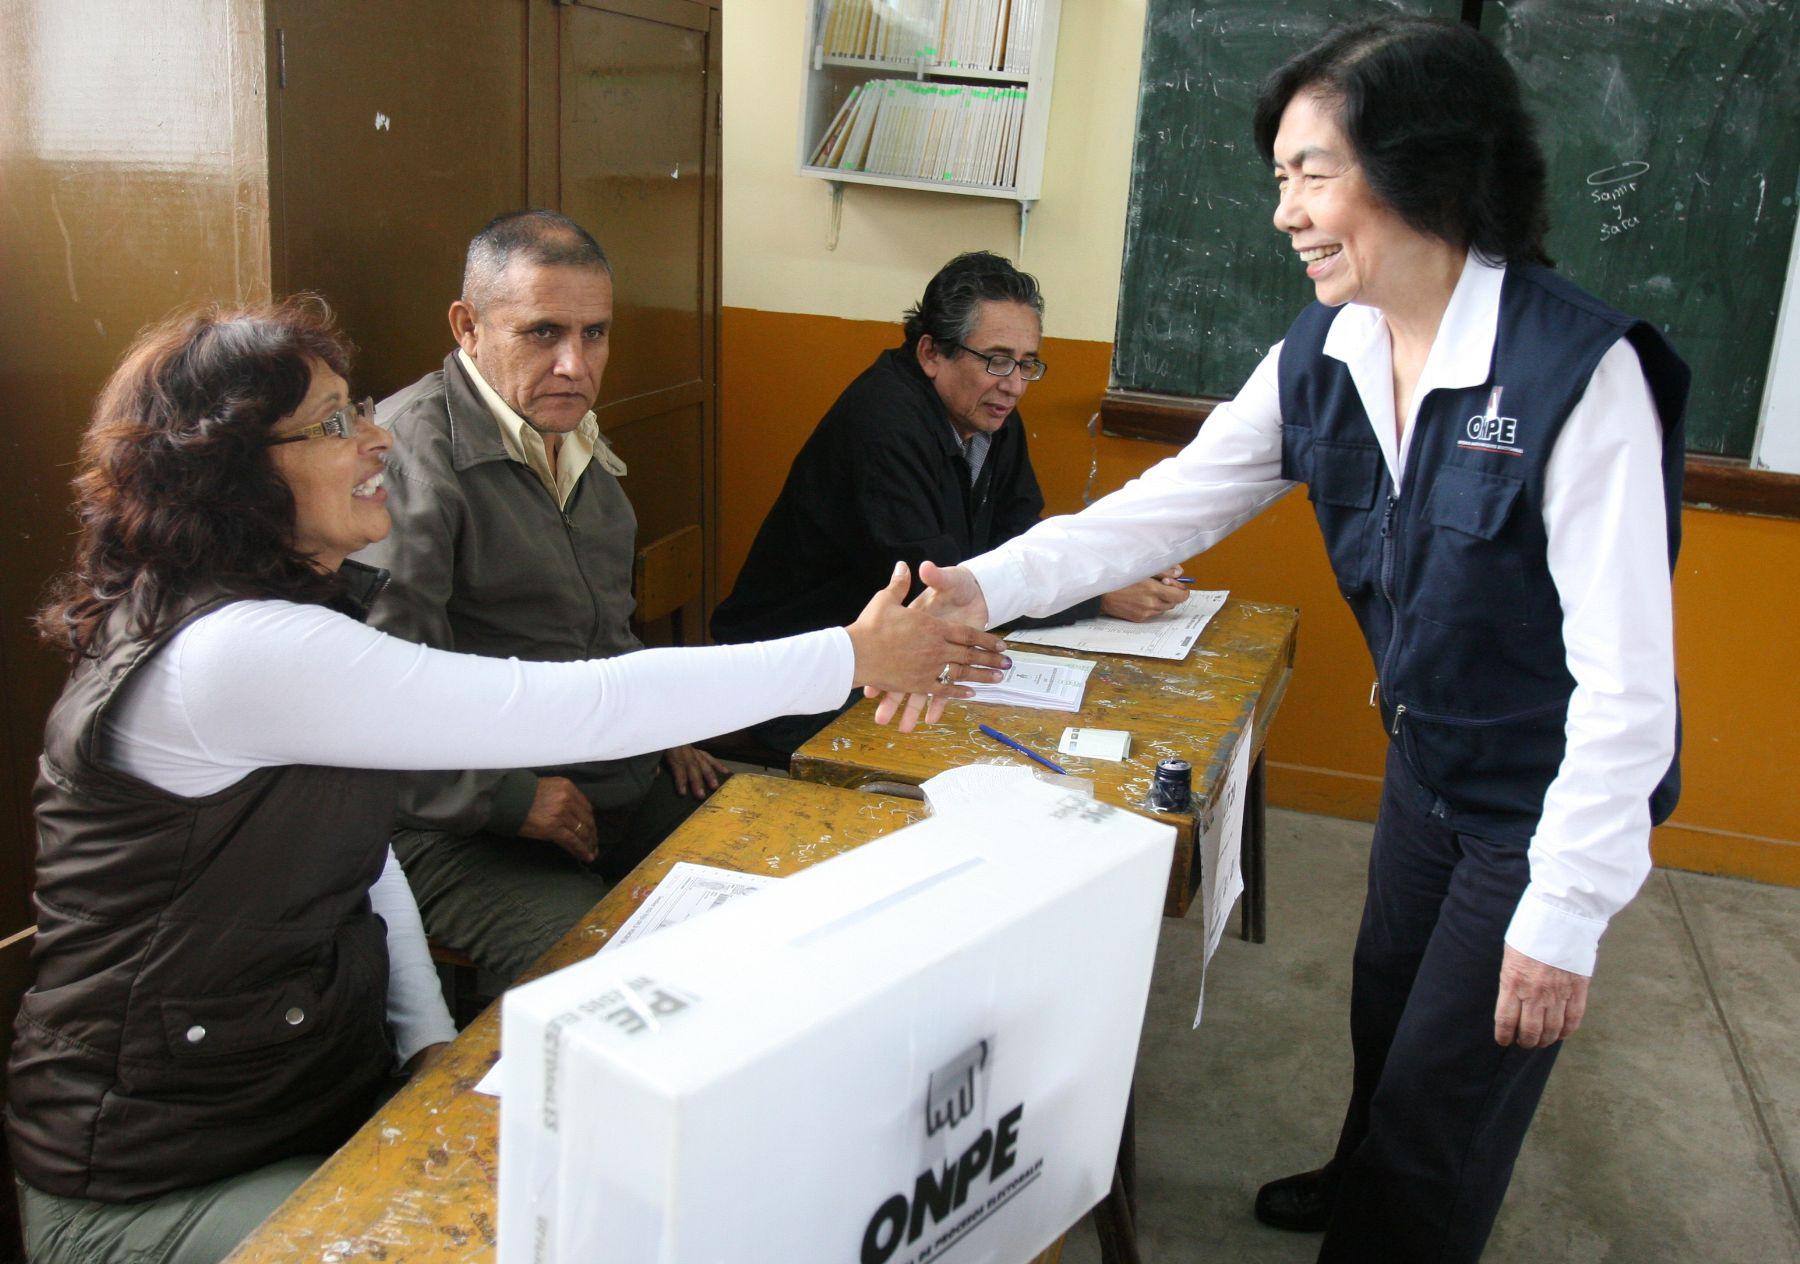 Jefa de la Oficina Nacional de Procesos Electorales, Magdalena Chú. Foto: ANDINA/Héctor Vinces